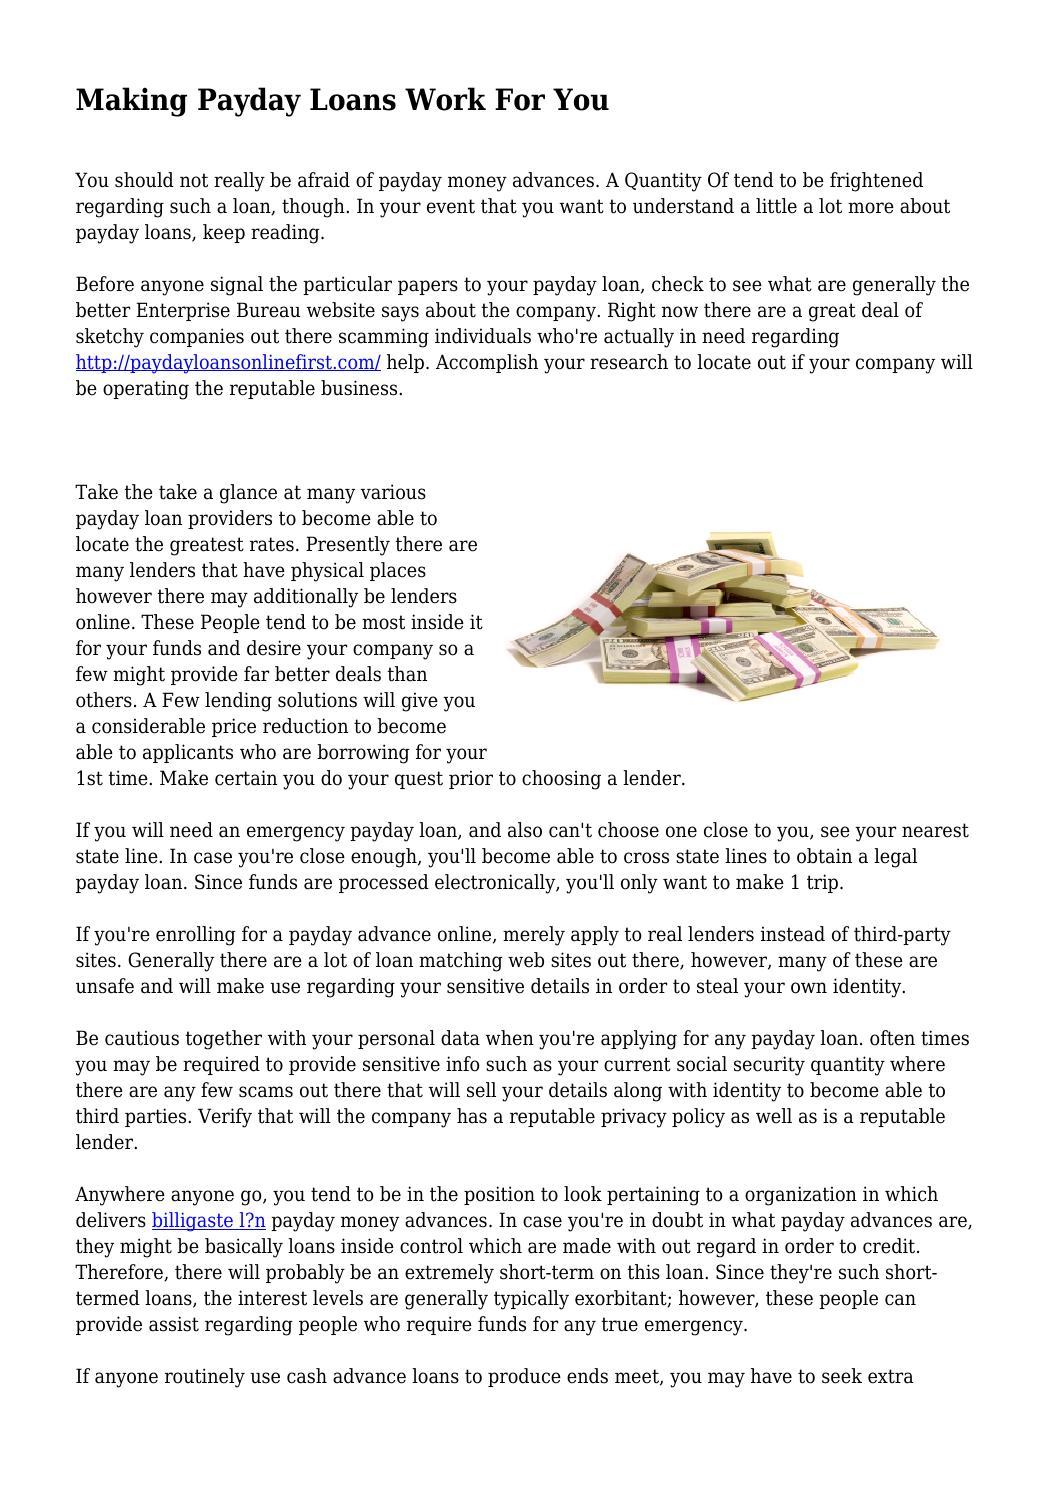 Sorensens loans till payday image 3